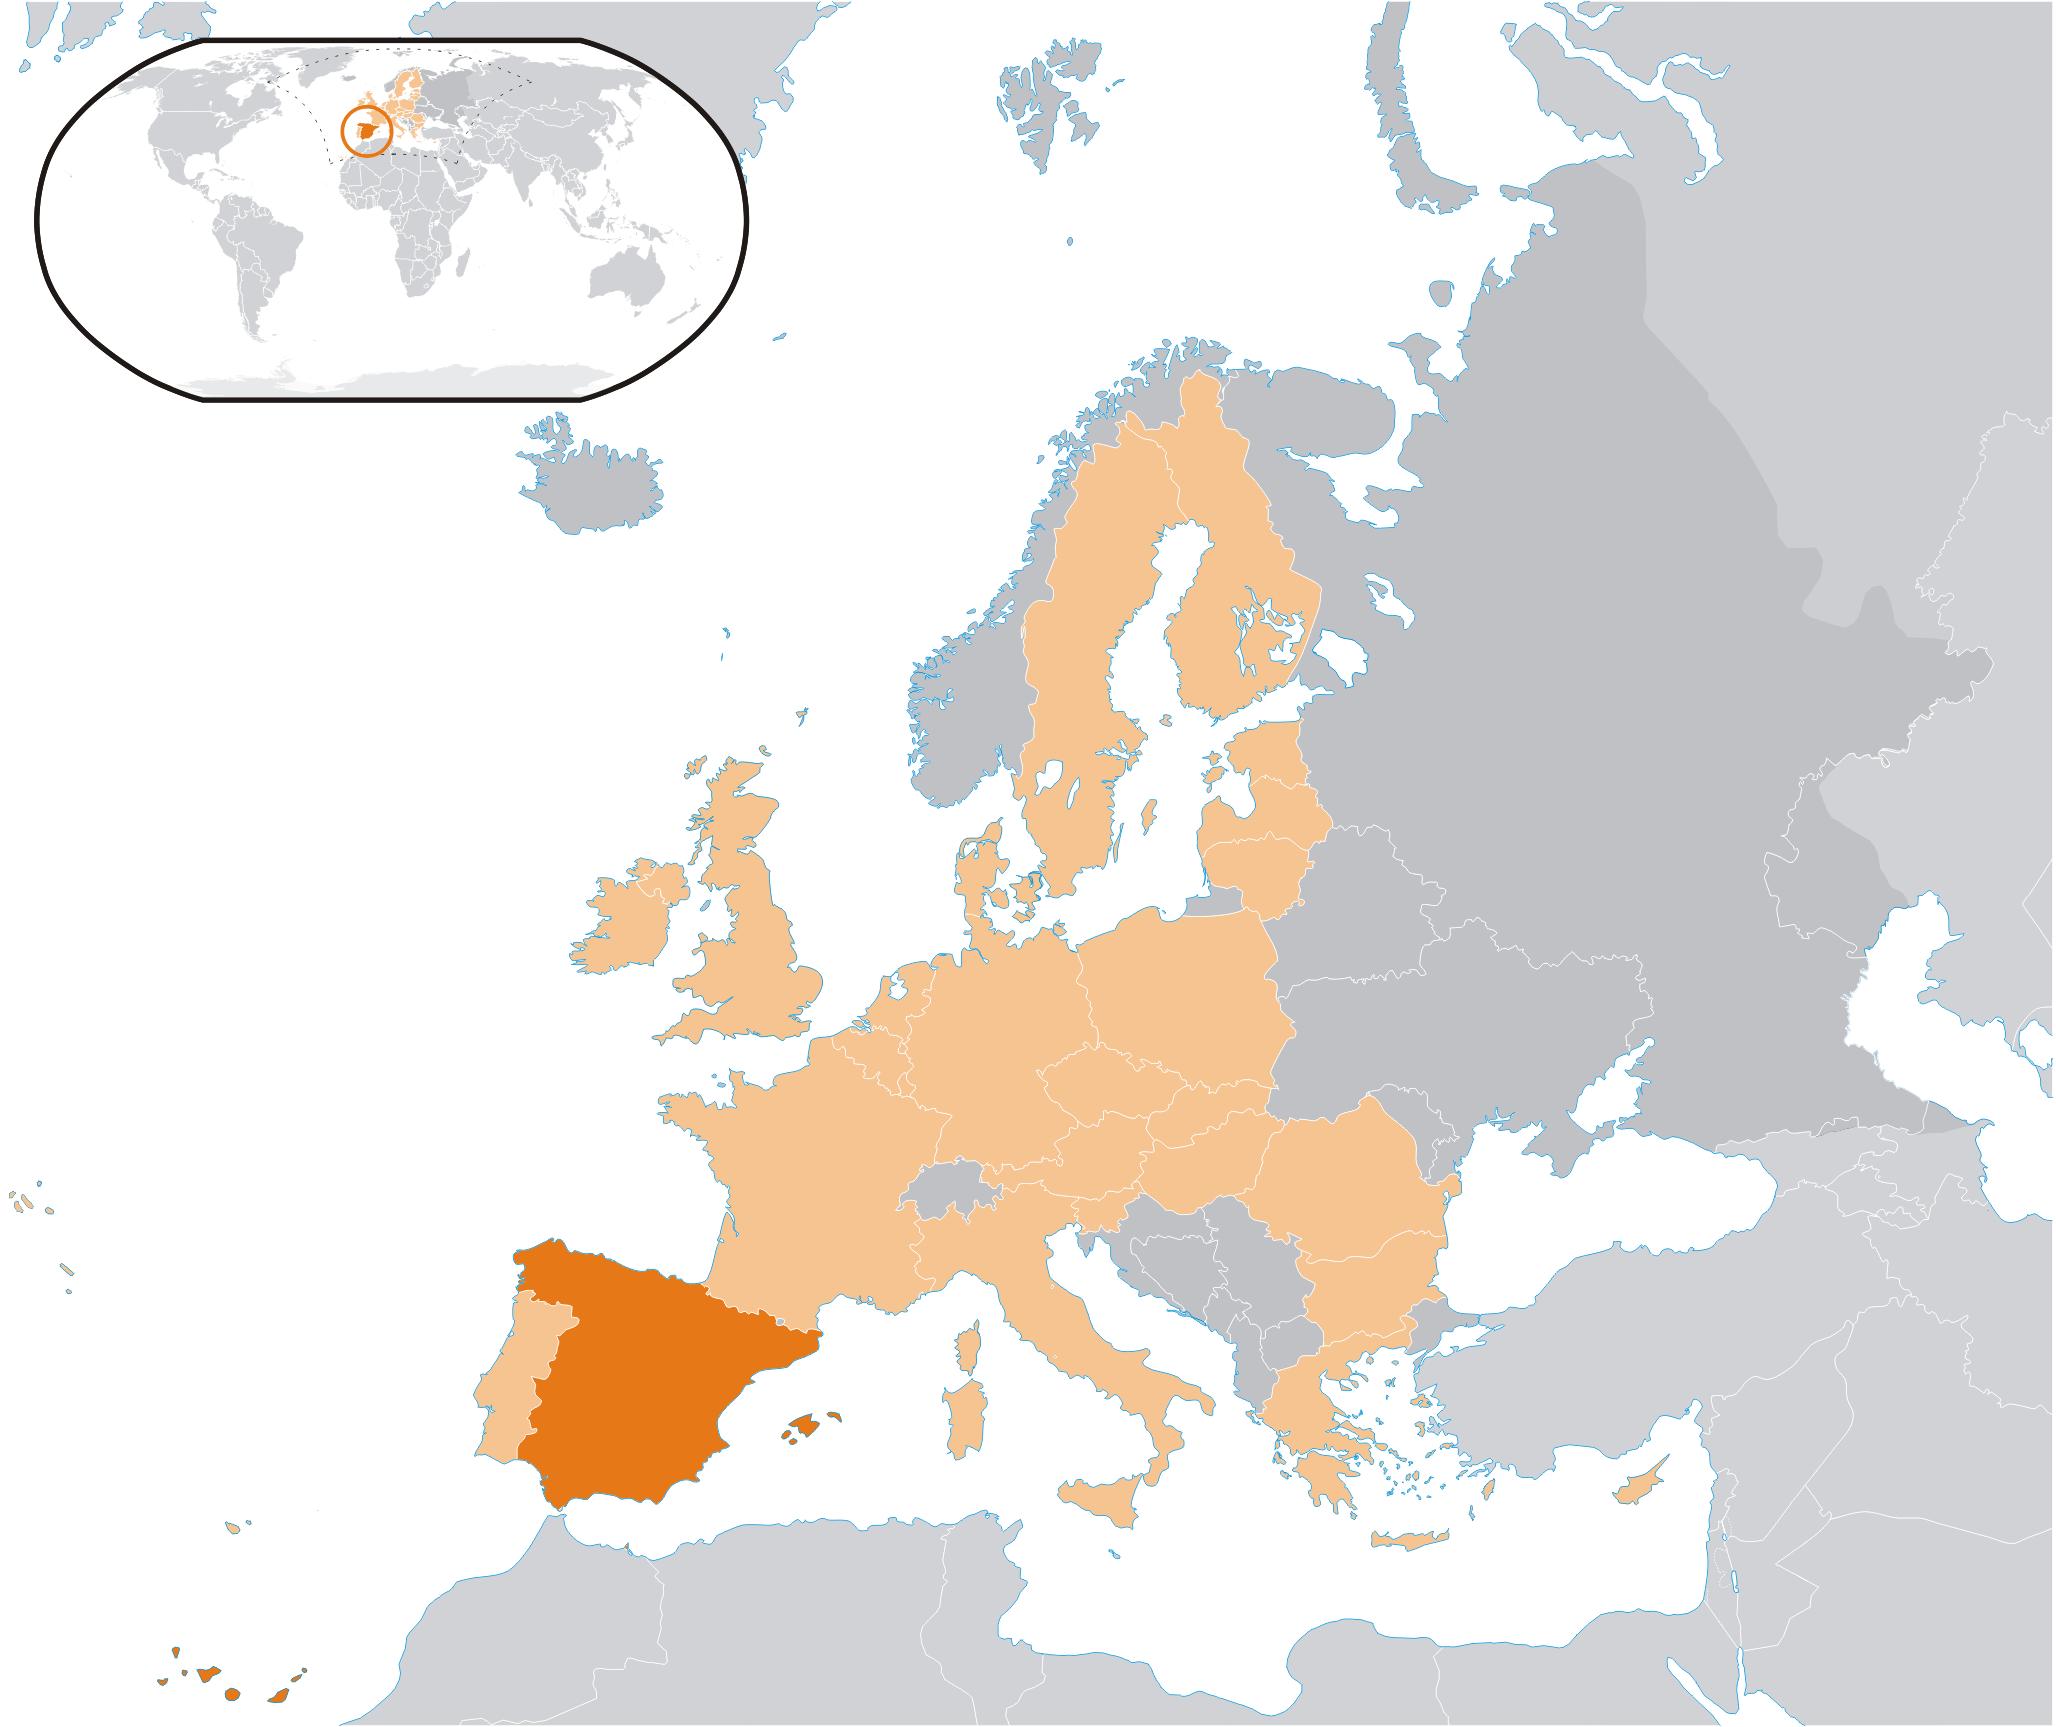 Filelocation spain eu europe 3g wikimedia commons filelocation spain eu europe 3g publicscrutiny Images